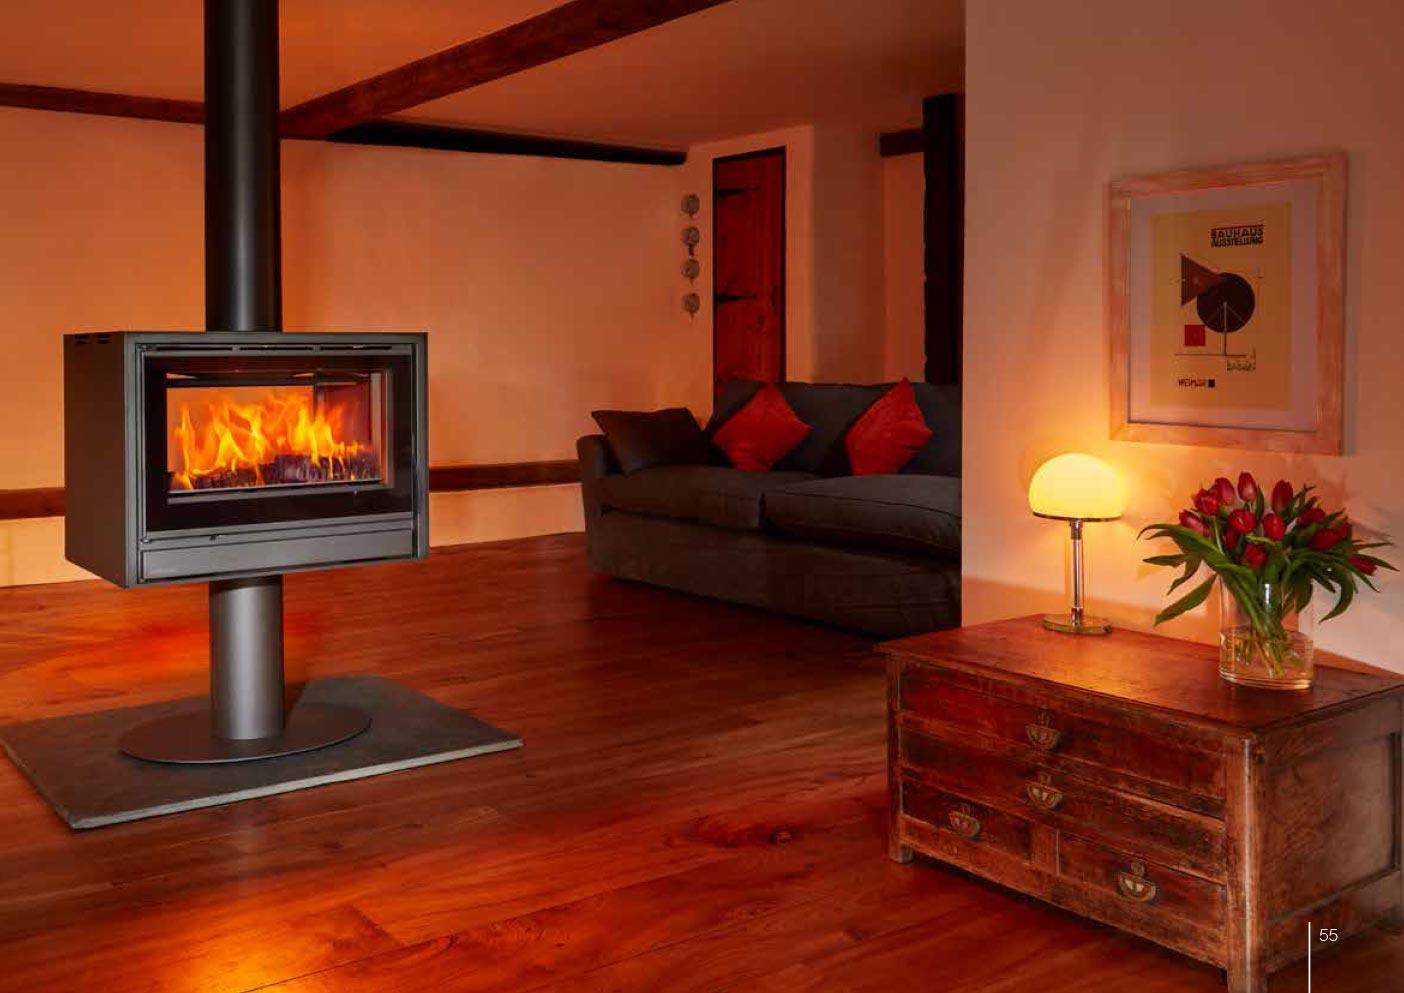 opus-stoves-brochure-(2)-55